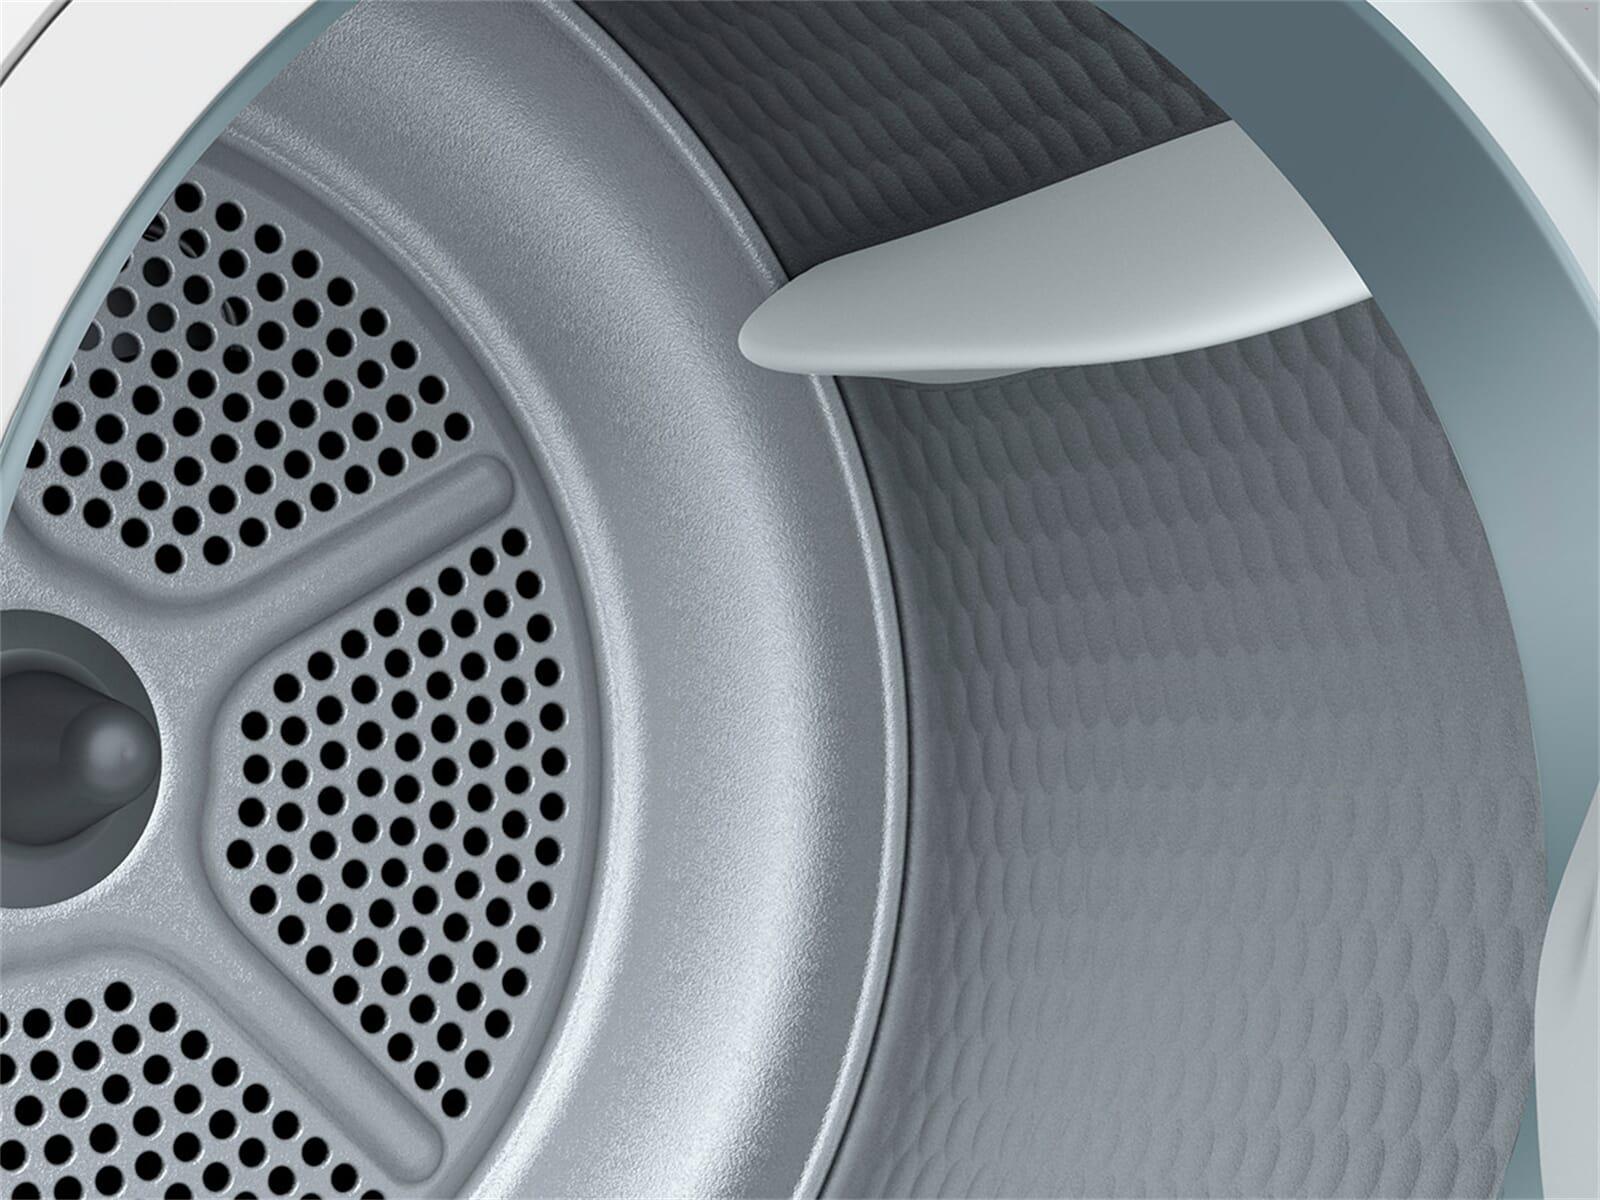 Siemens wt a trockner weiß